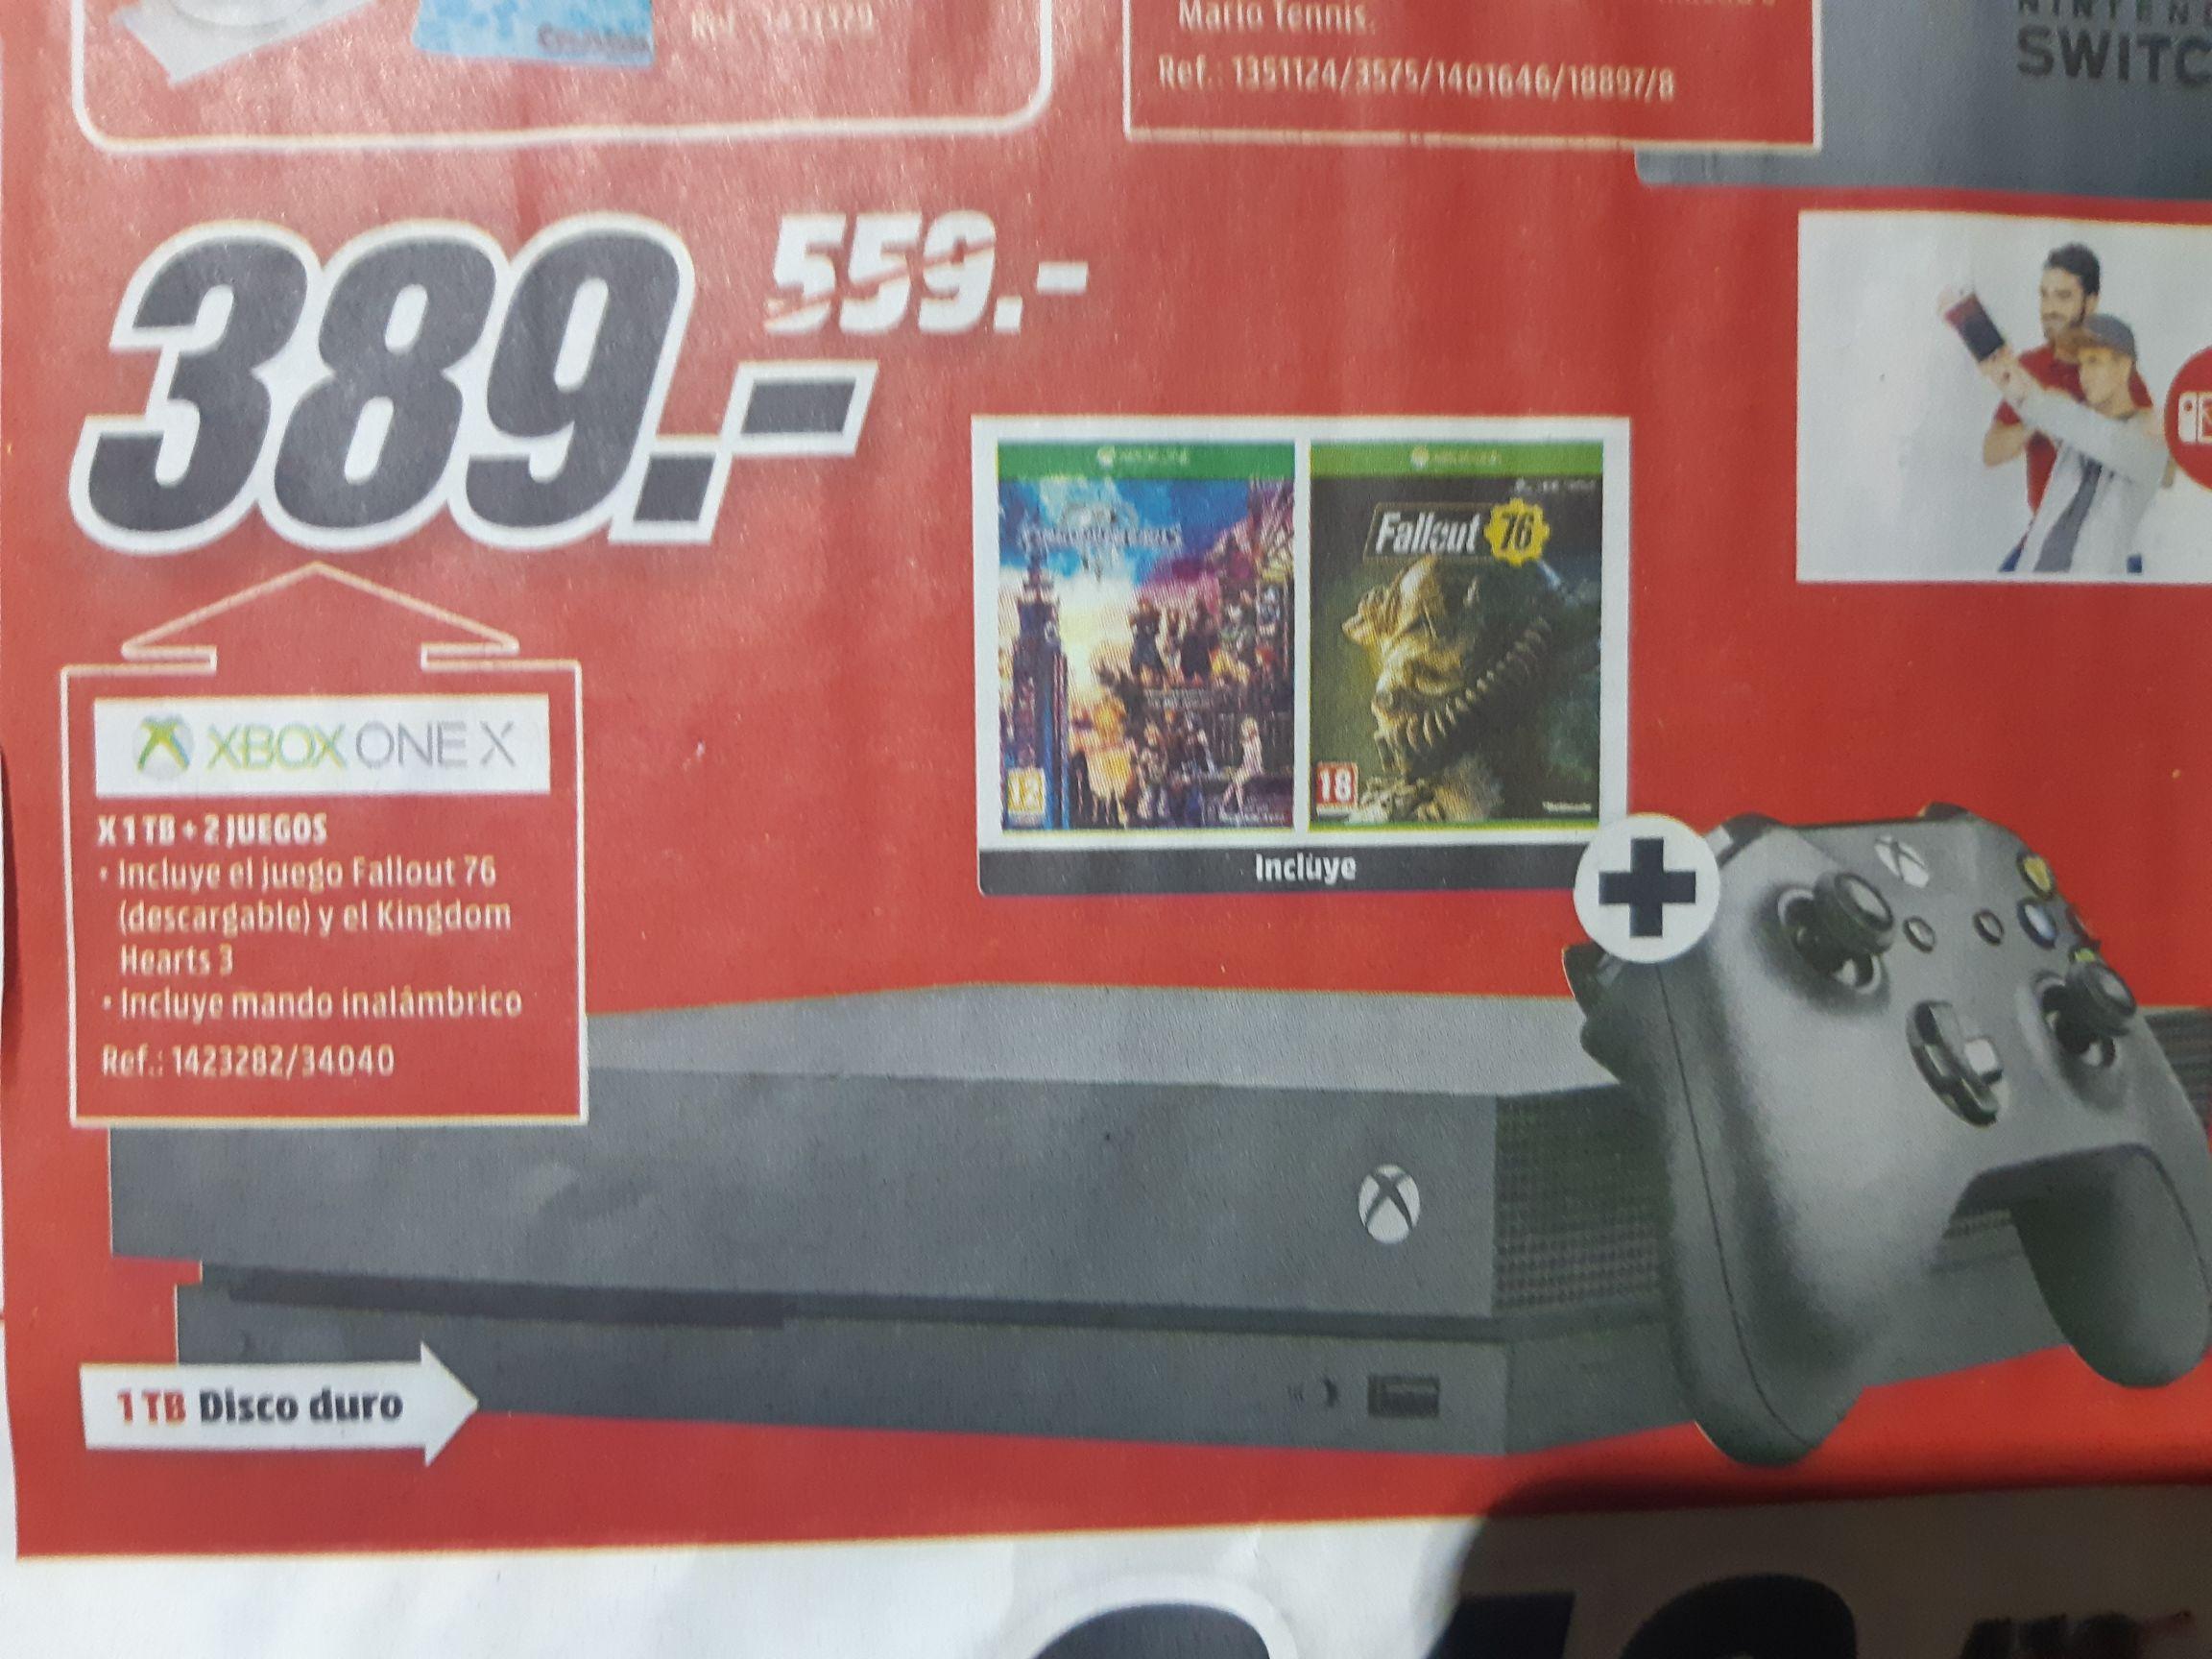 Xbox one x con Fallout 76 y kingdom Hearts 3 de regalo